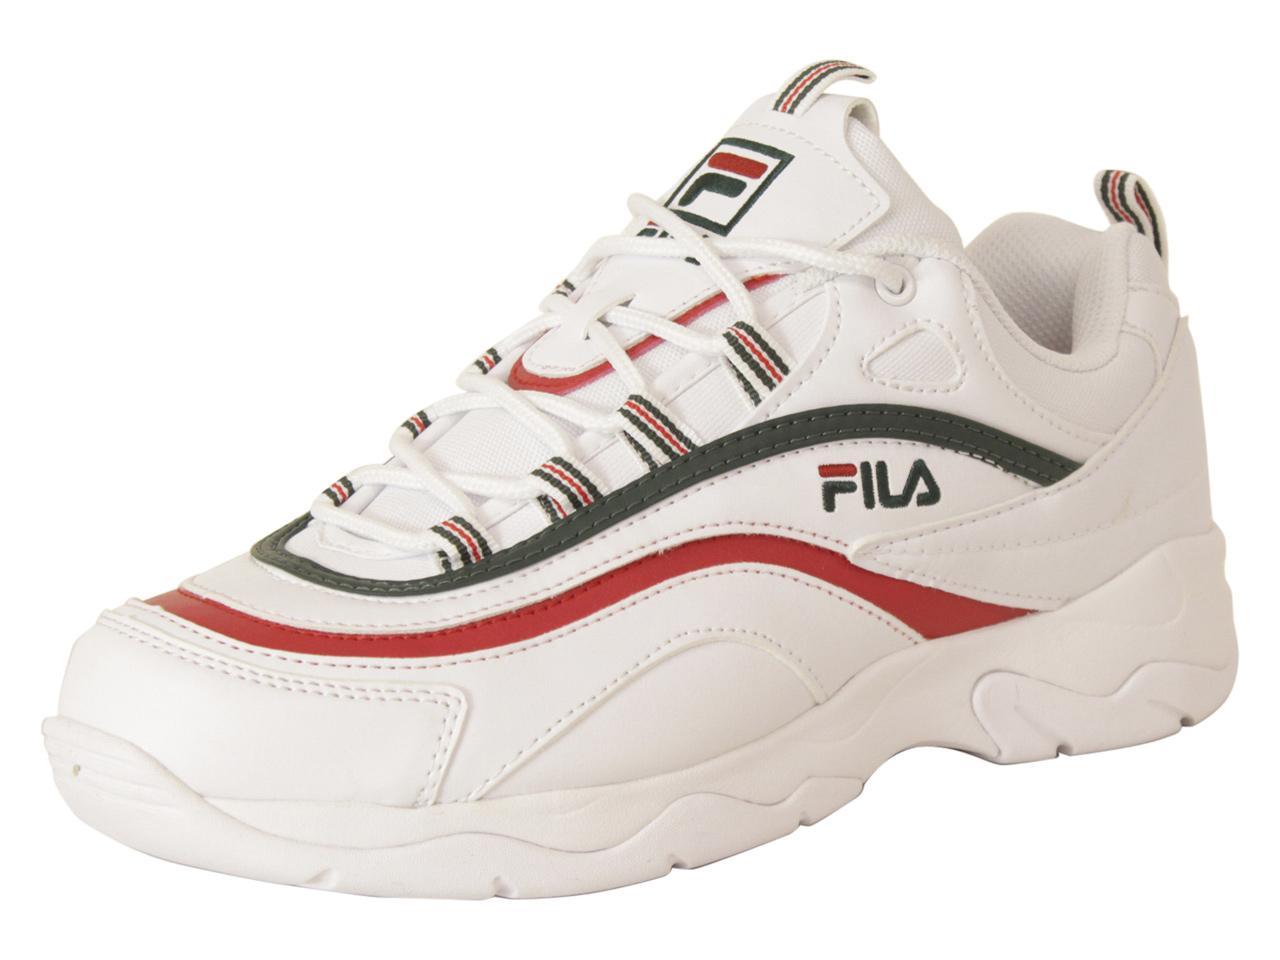 Fila Men's Fila Ray Sneakers Shoes